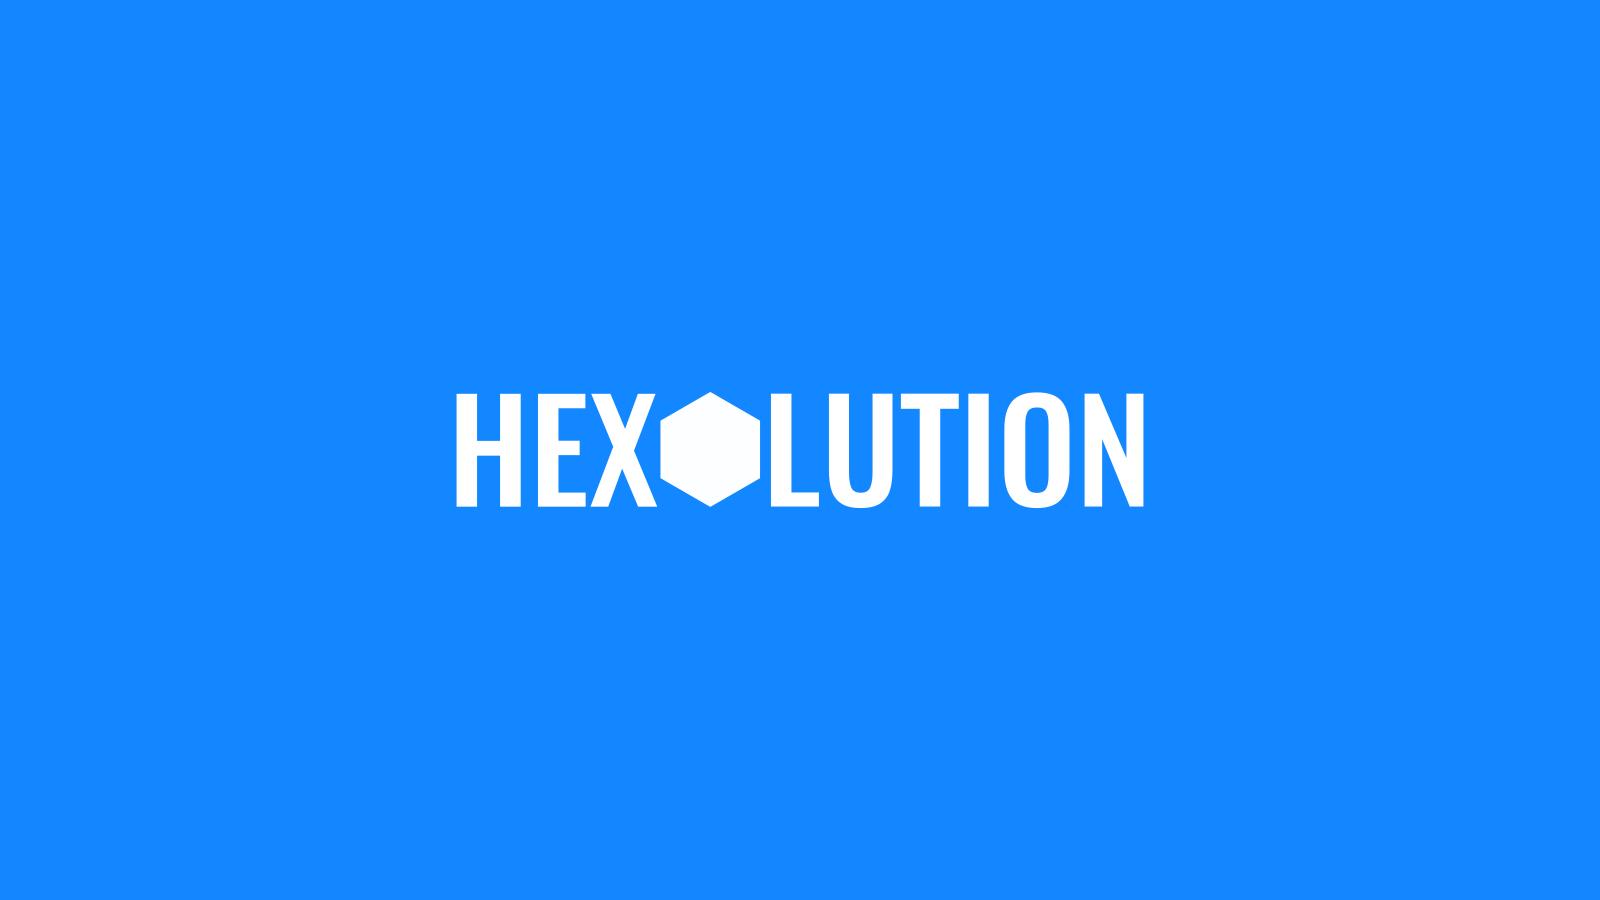 Hexolution - Logic Puzzle Game